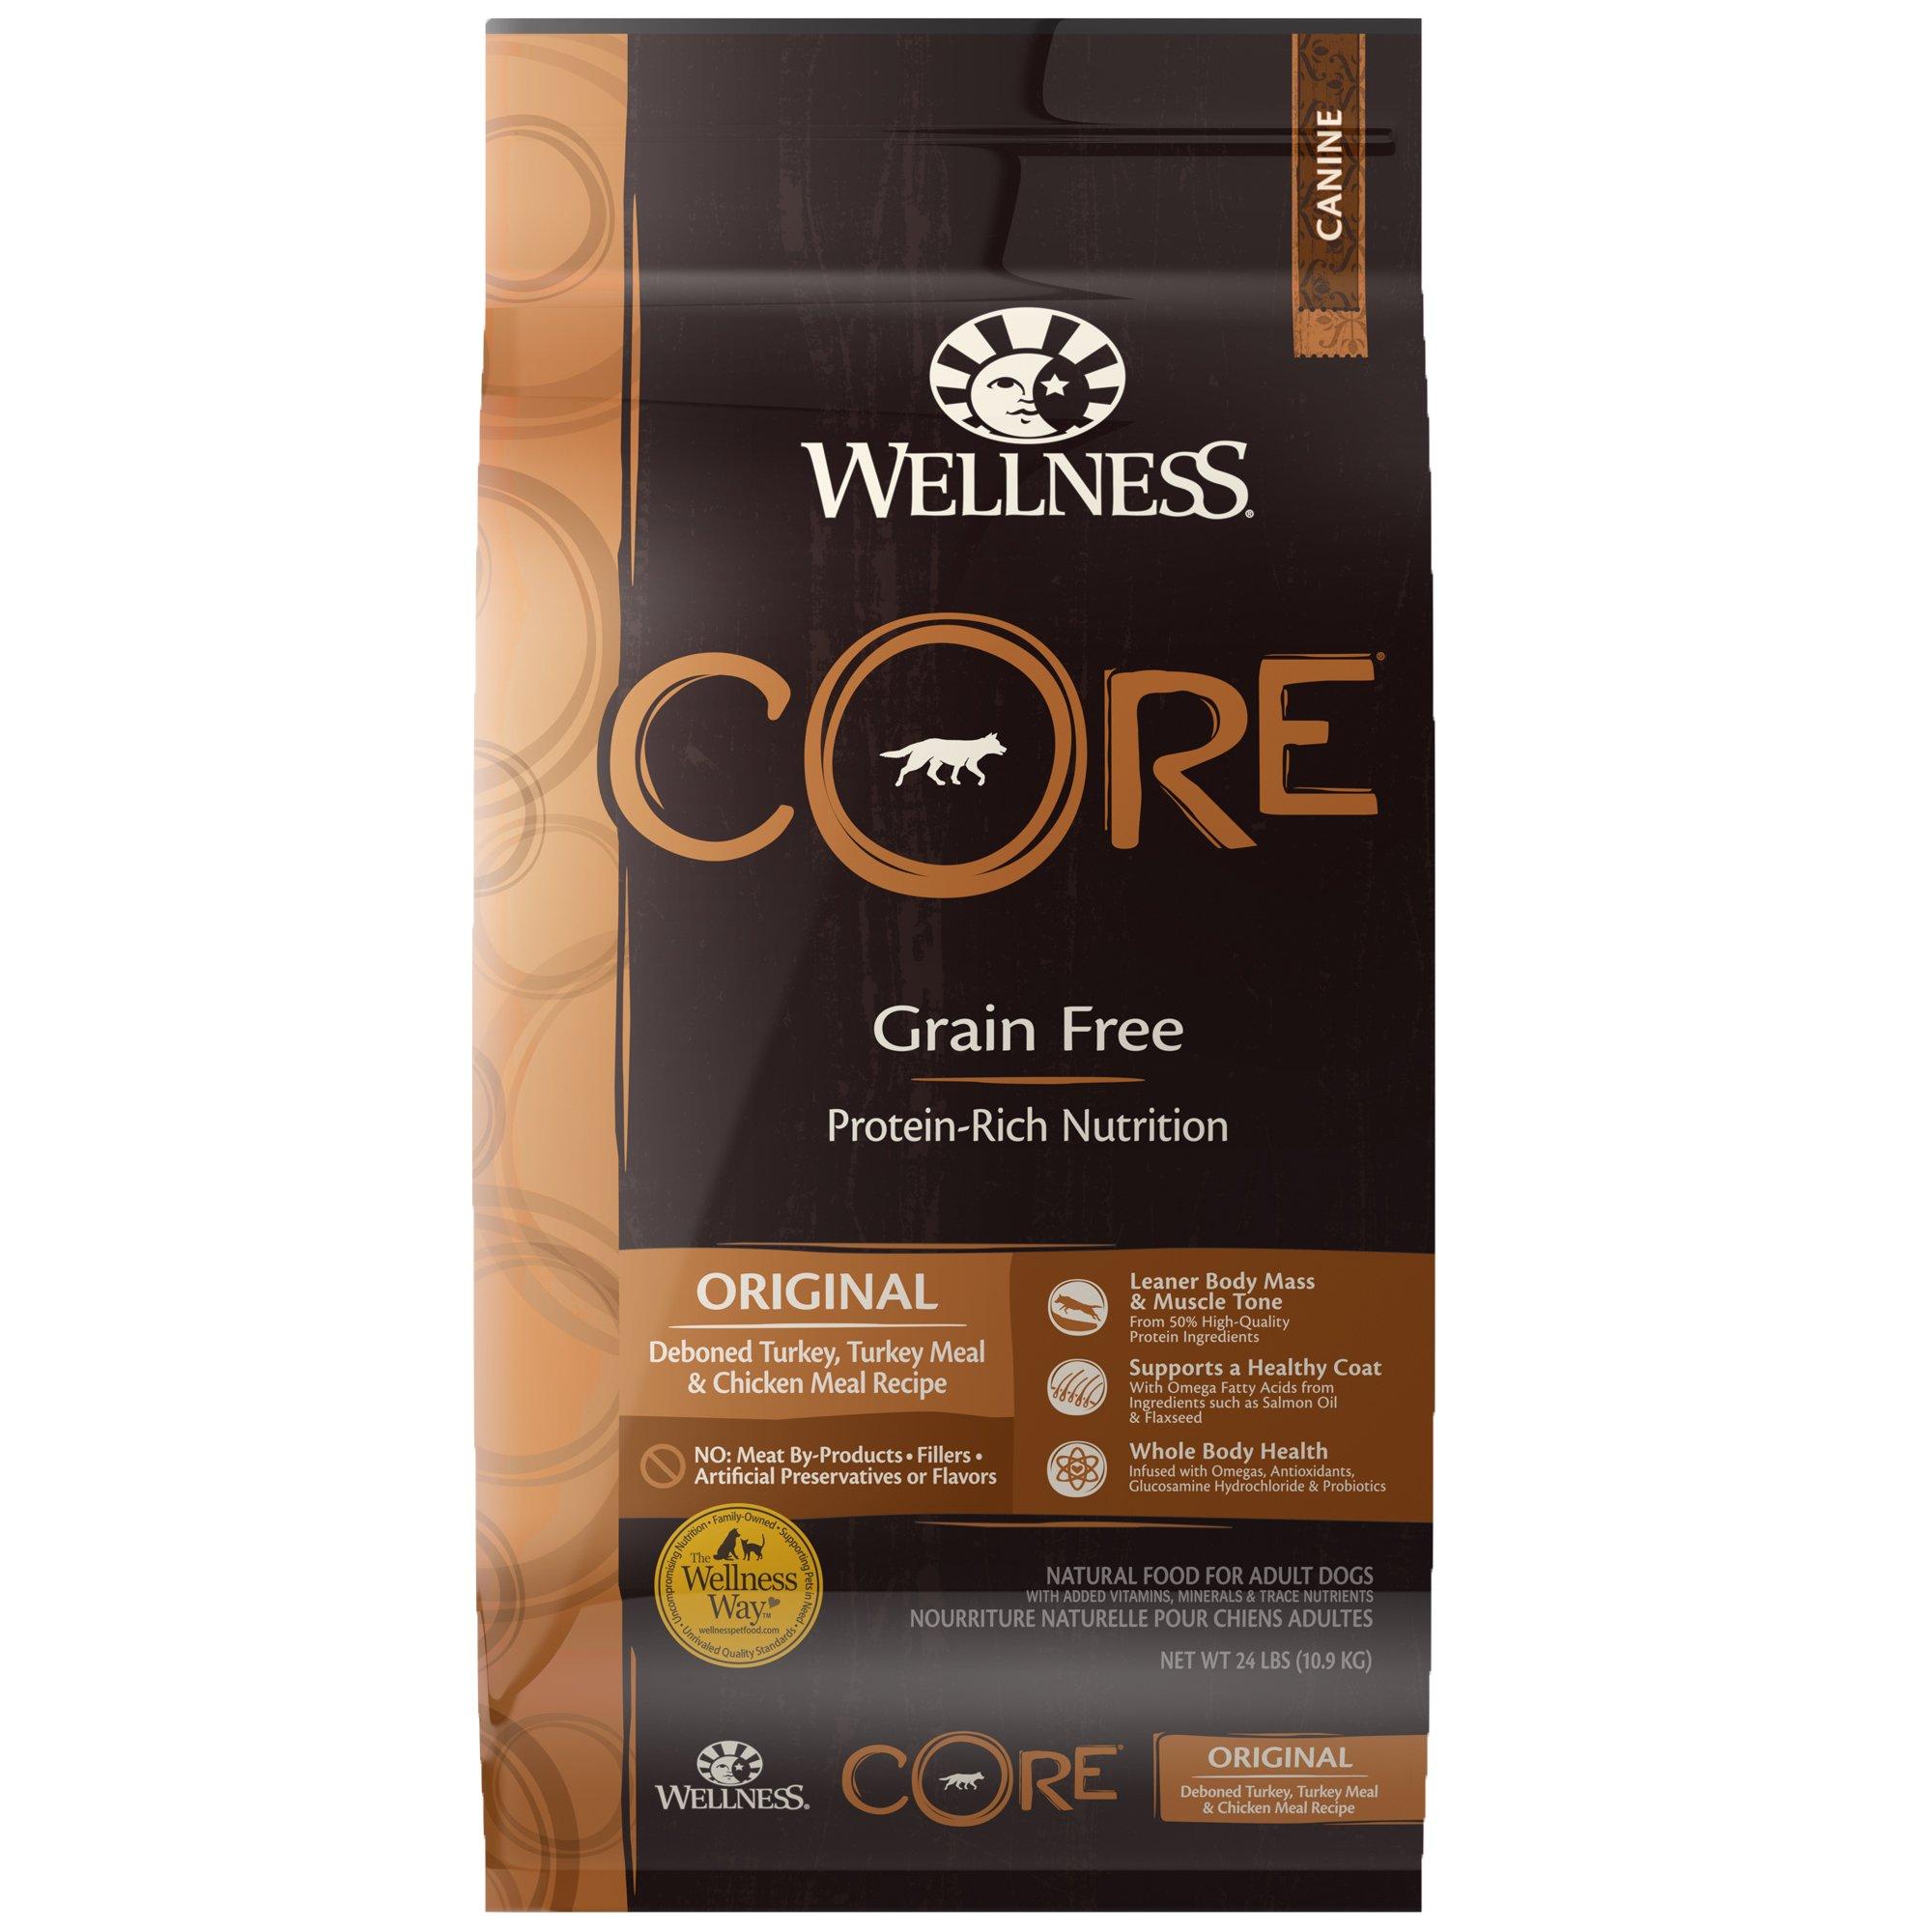 Wellness Core Original Dog Food Petco